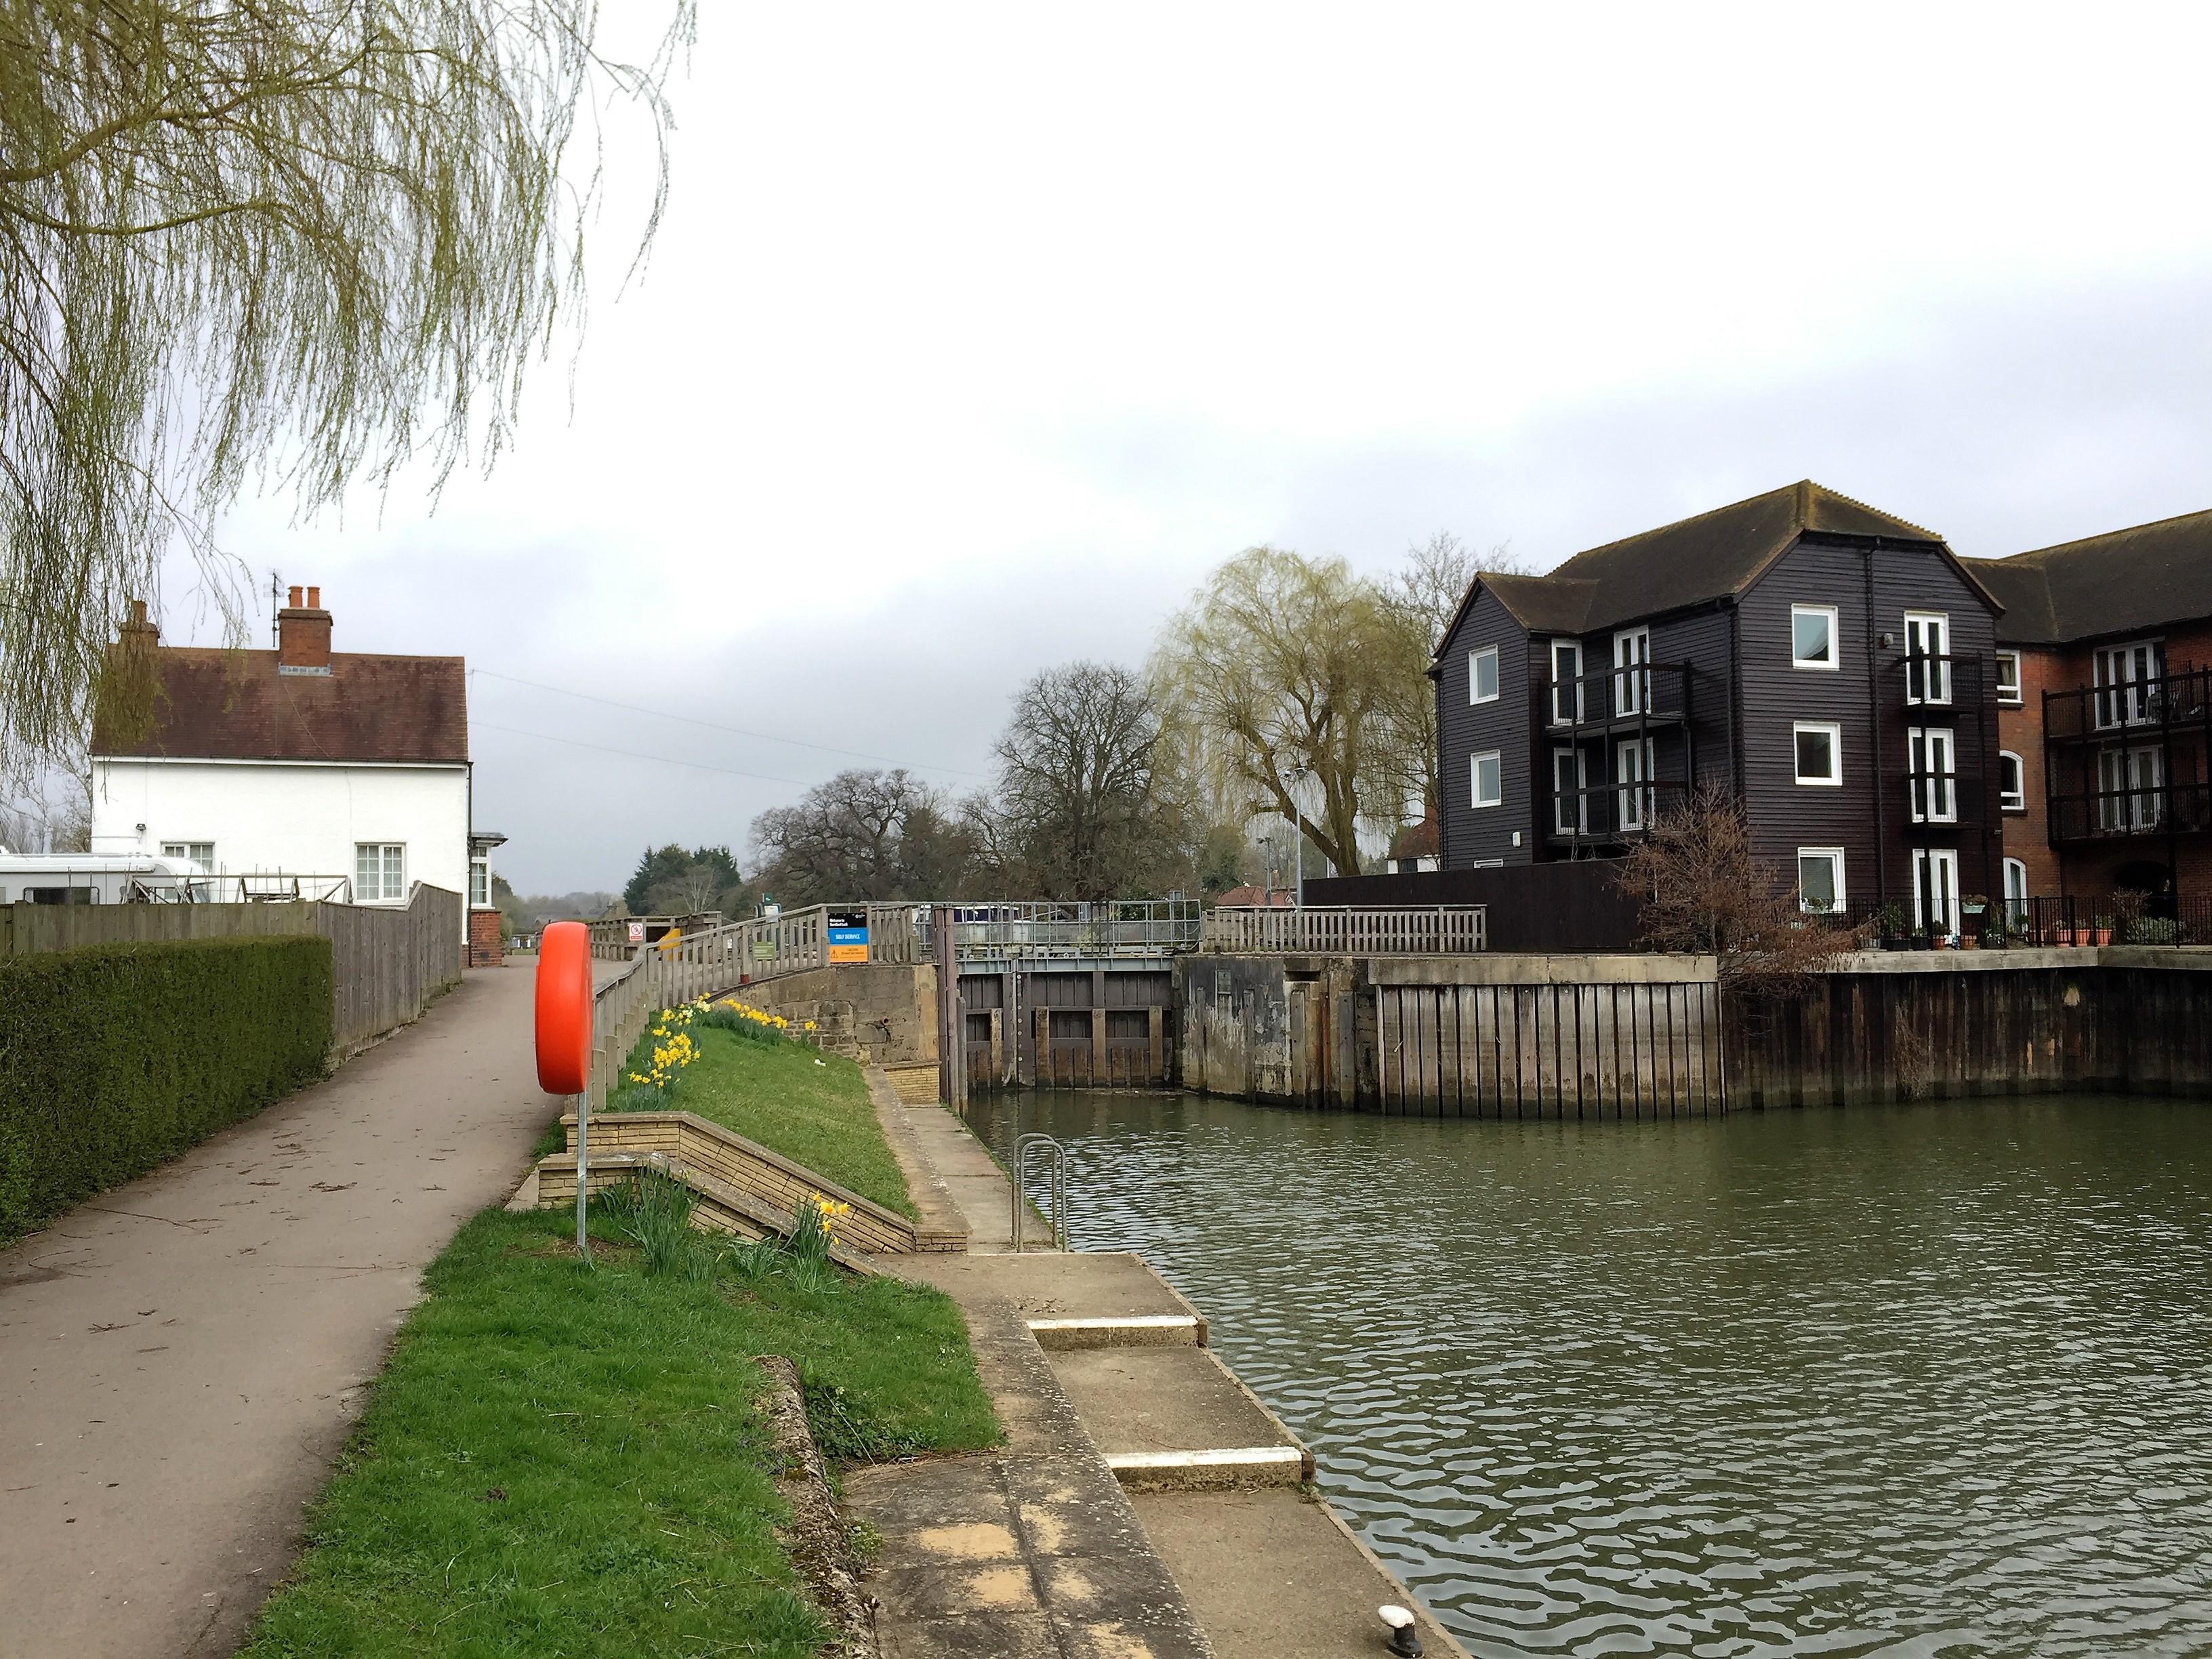 Arriving at Sandford Lock